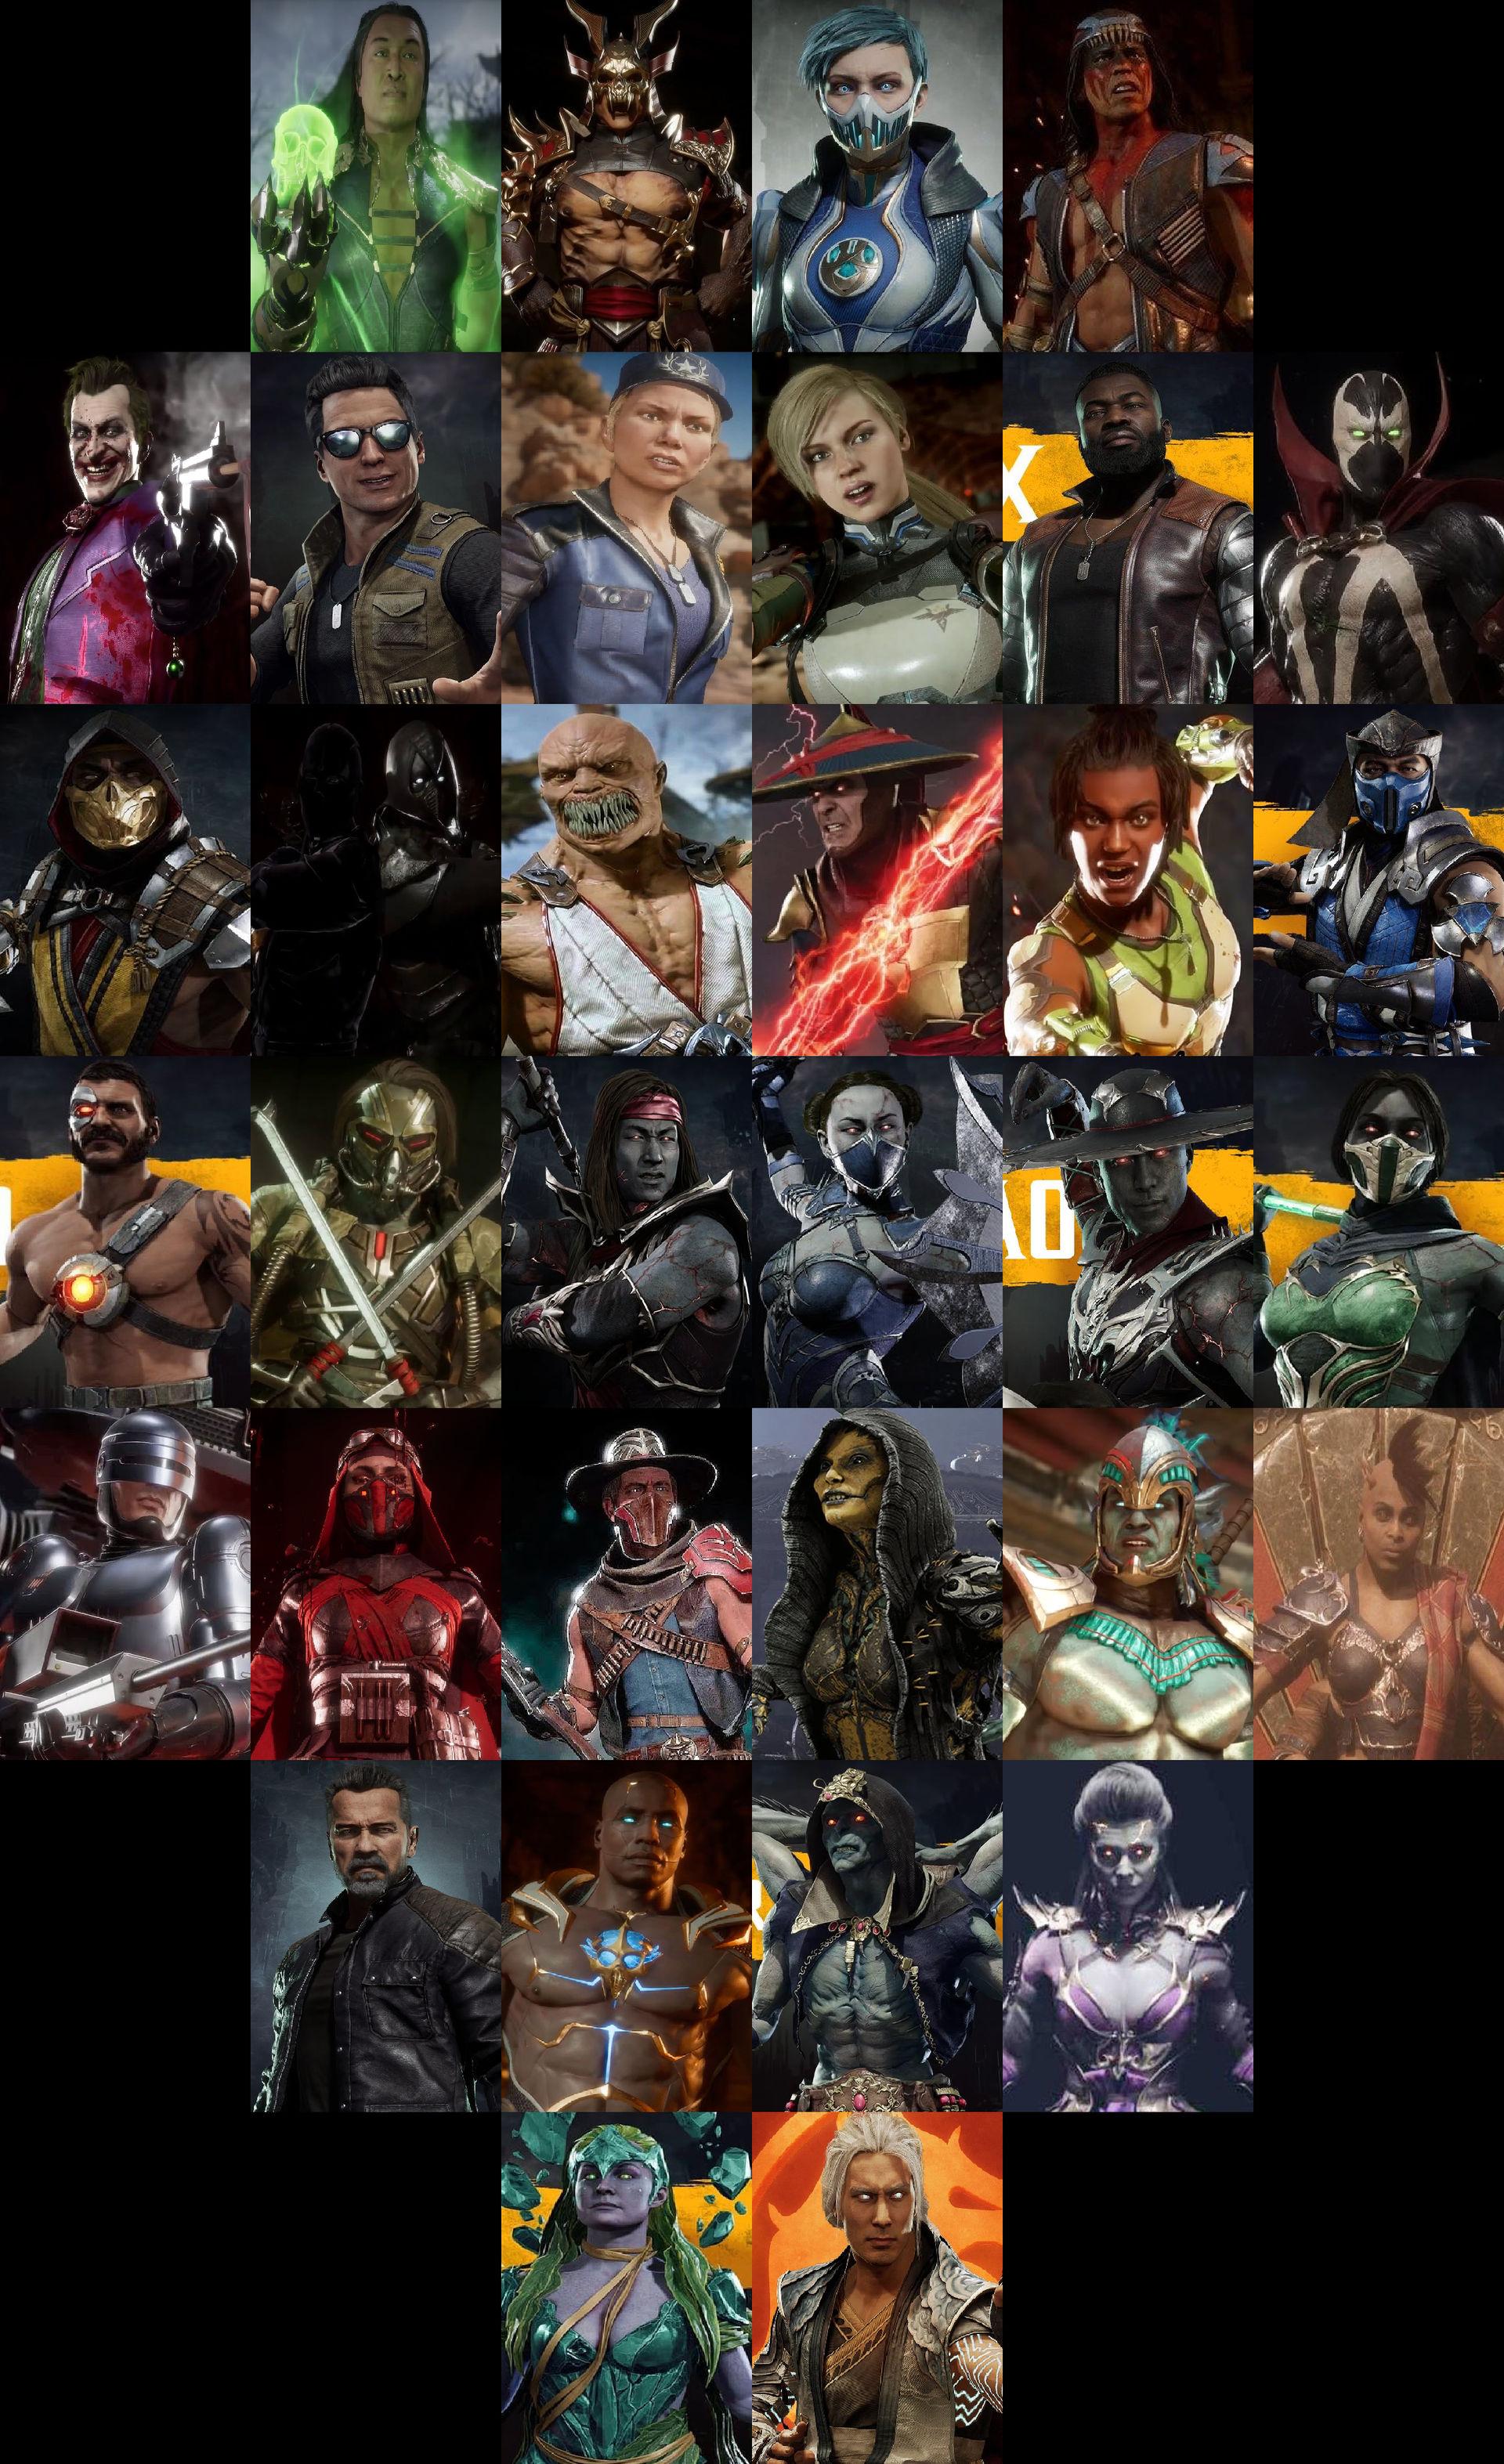 Mortal Kombat 11 Aftermath Characters By Mnstrfrc On Deviantart